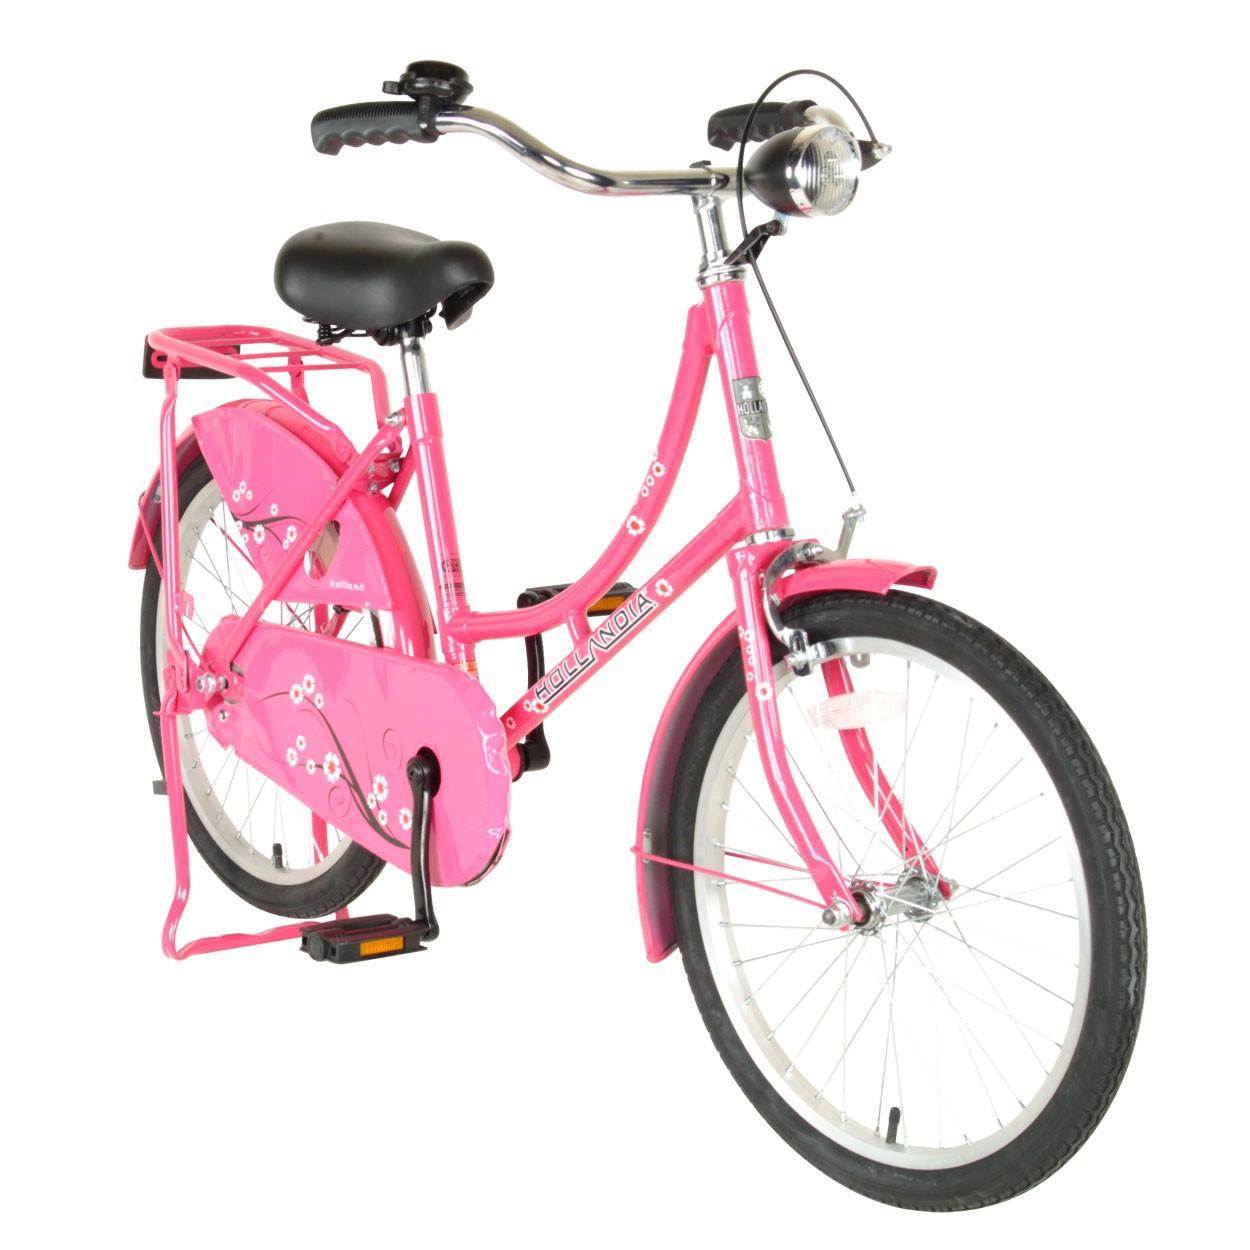 Hollandia New Oma 20 inch Bike